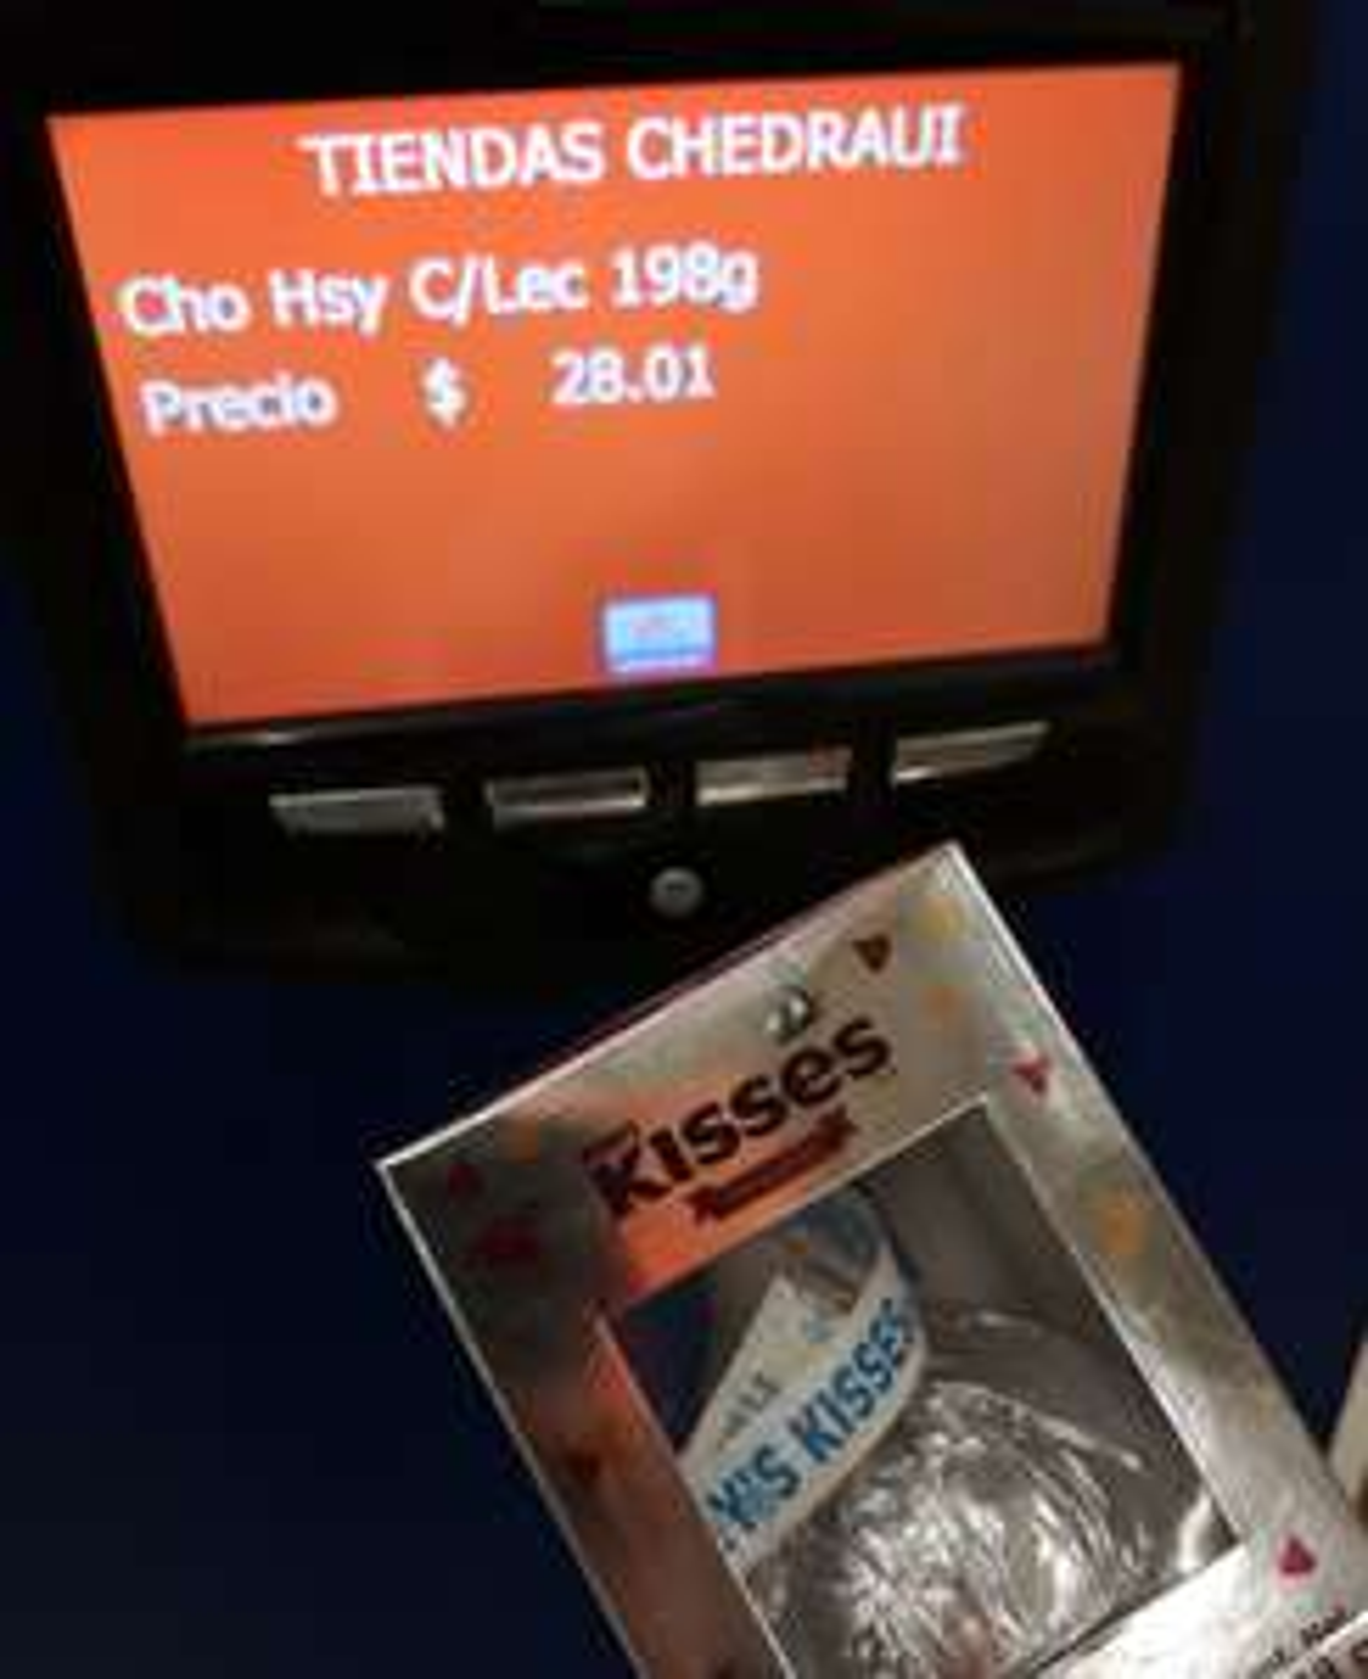 Chedraui: Chocolate kisses grande 3x2